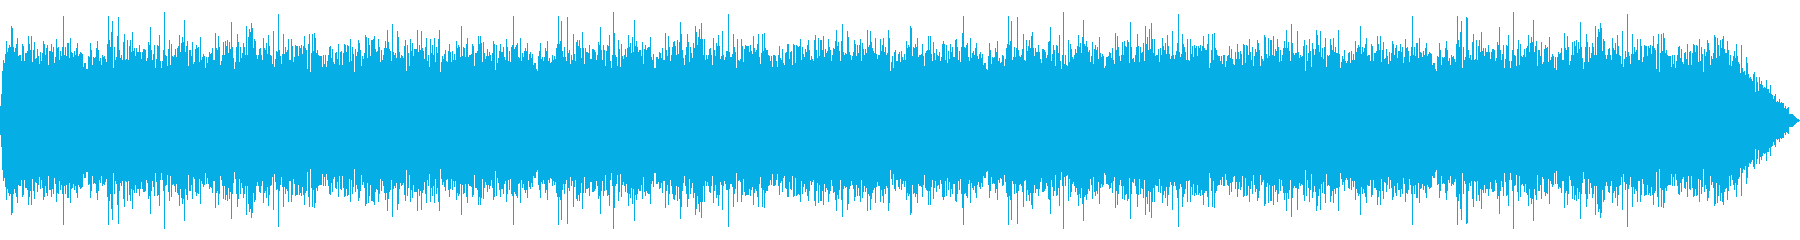 魔法詠唱、魔法発動、独白 17の再生済みの波形